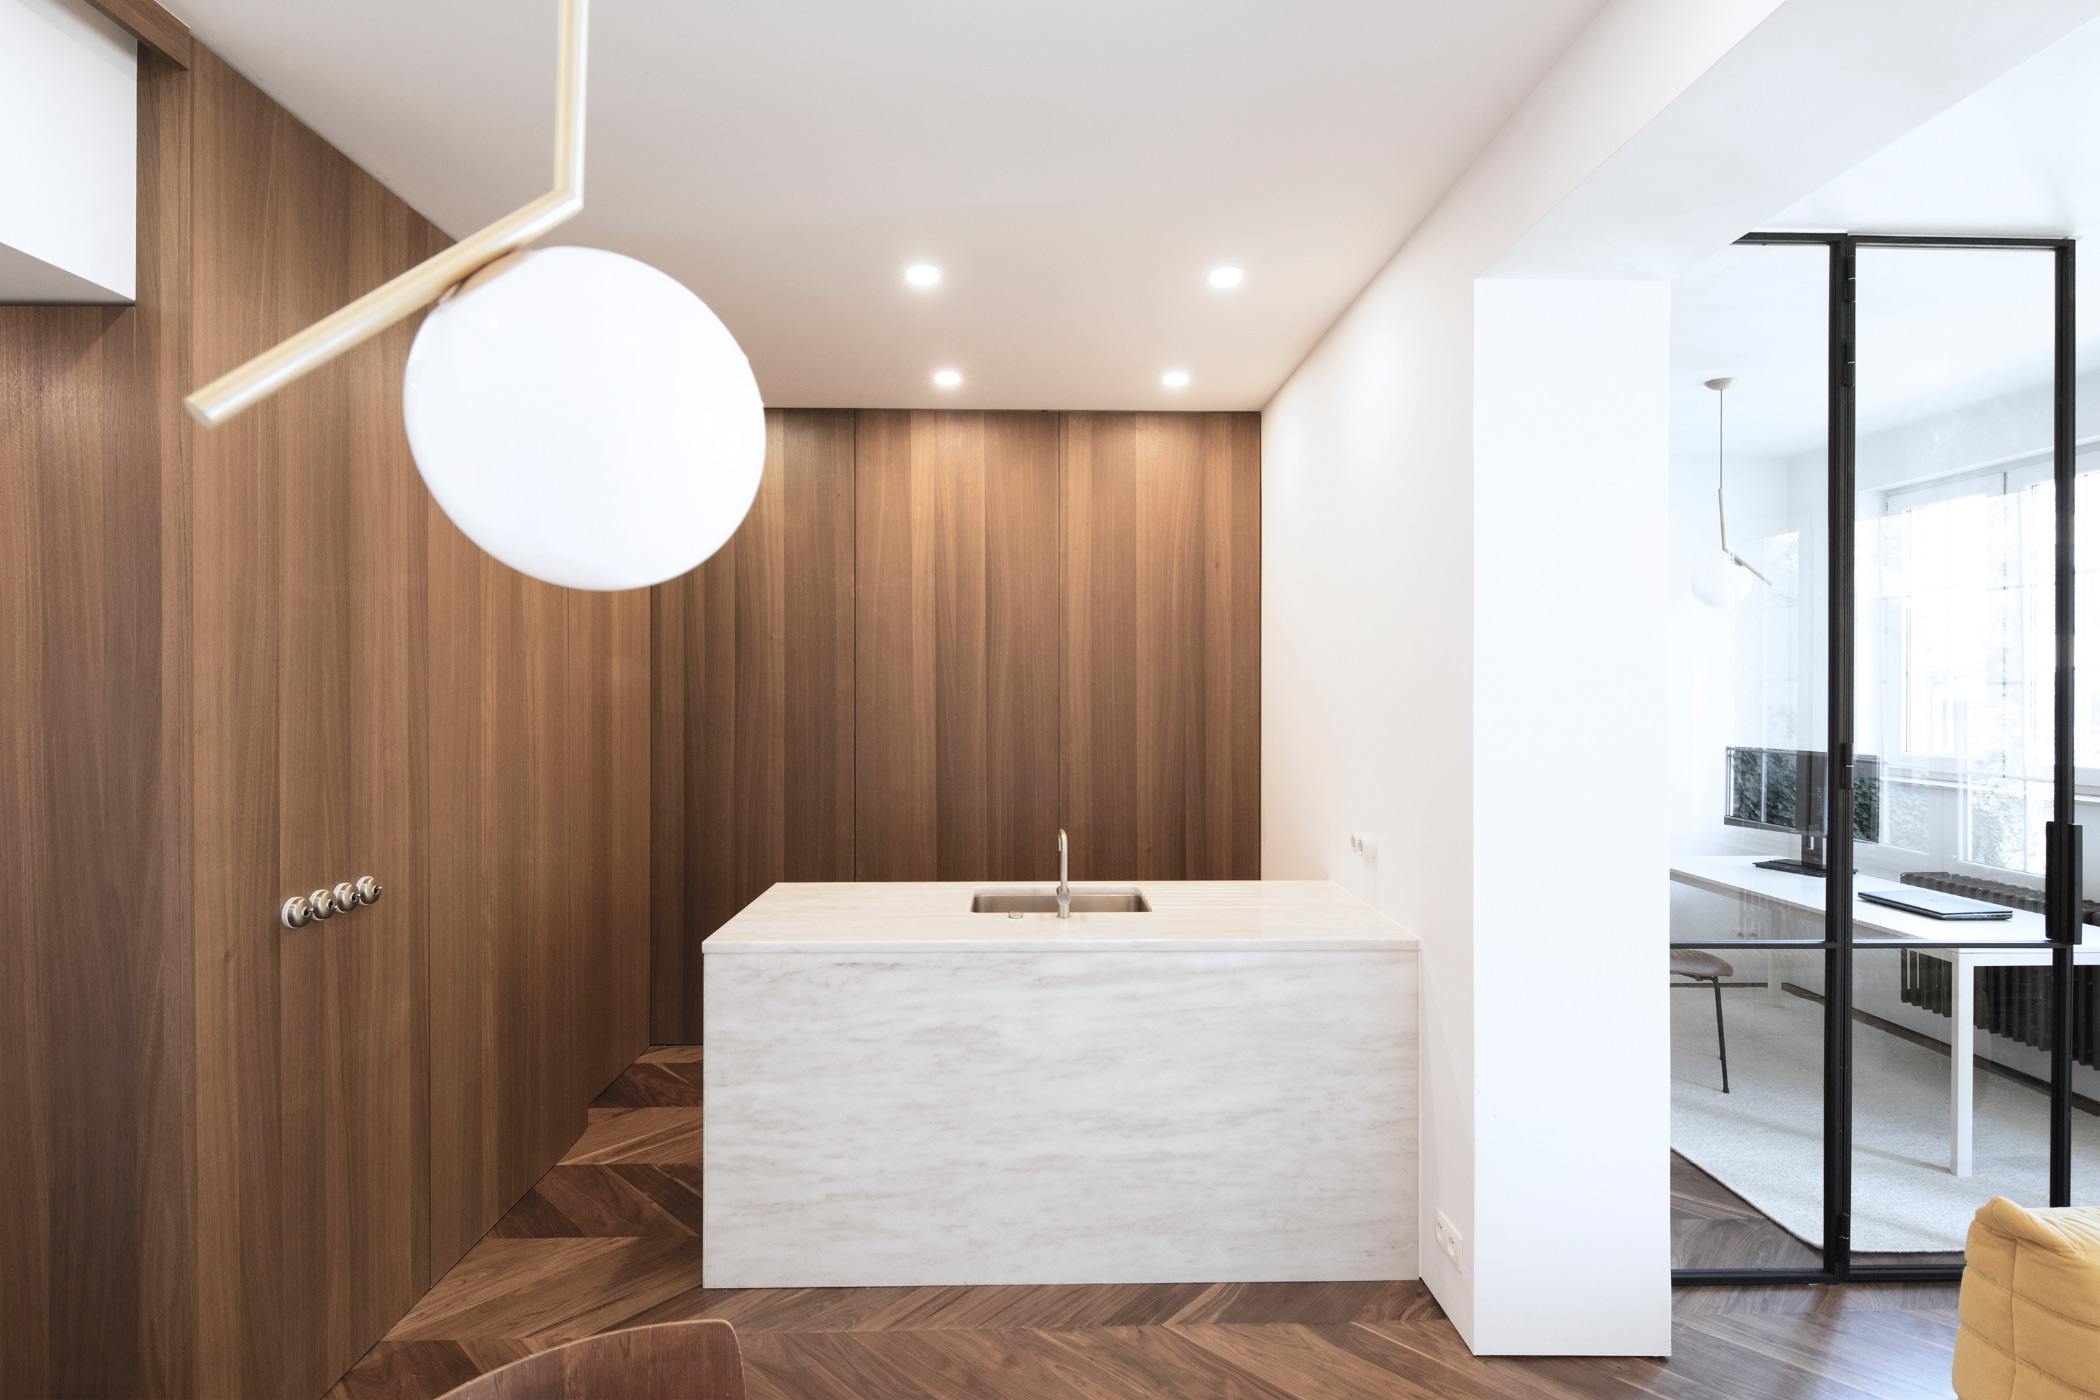 4_A&A's Apartment_Alexandru Patrichi_Inspirationist